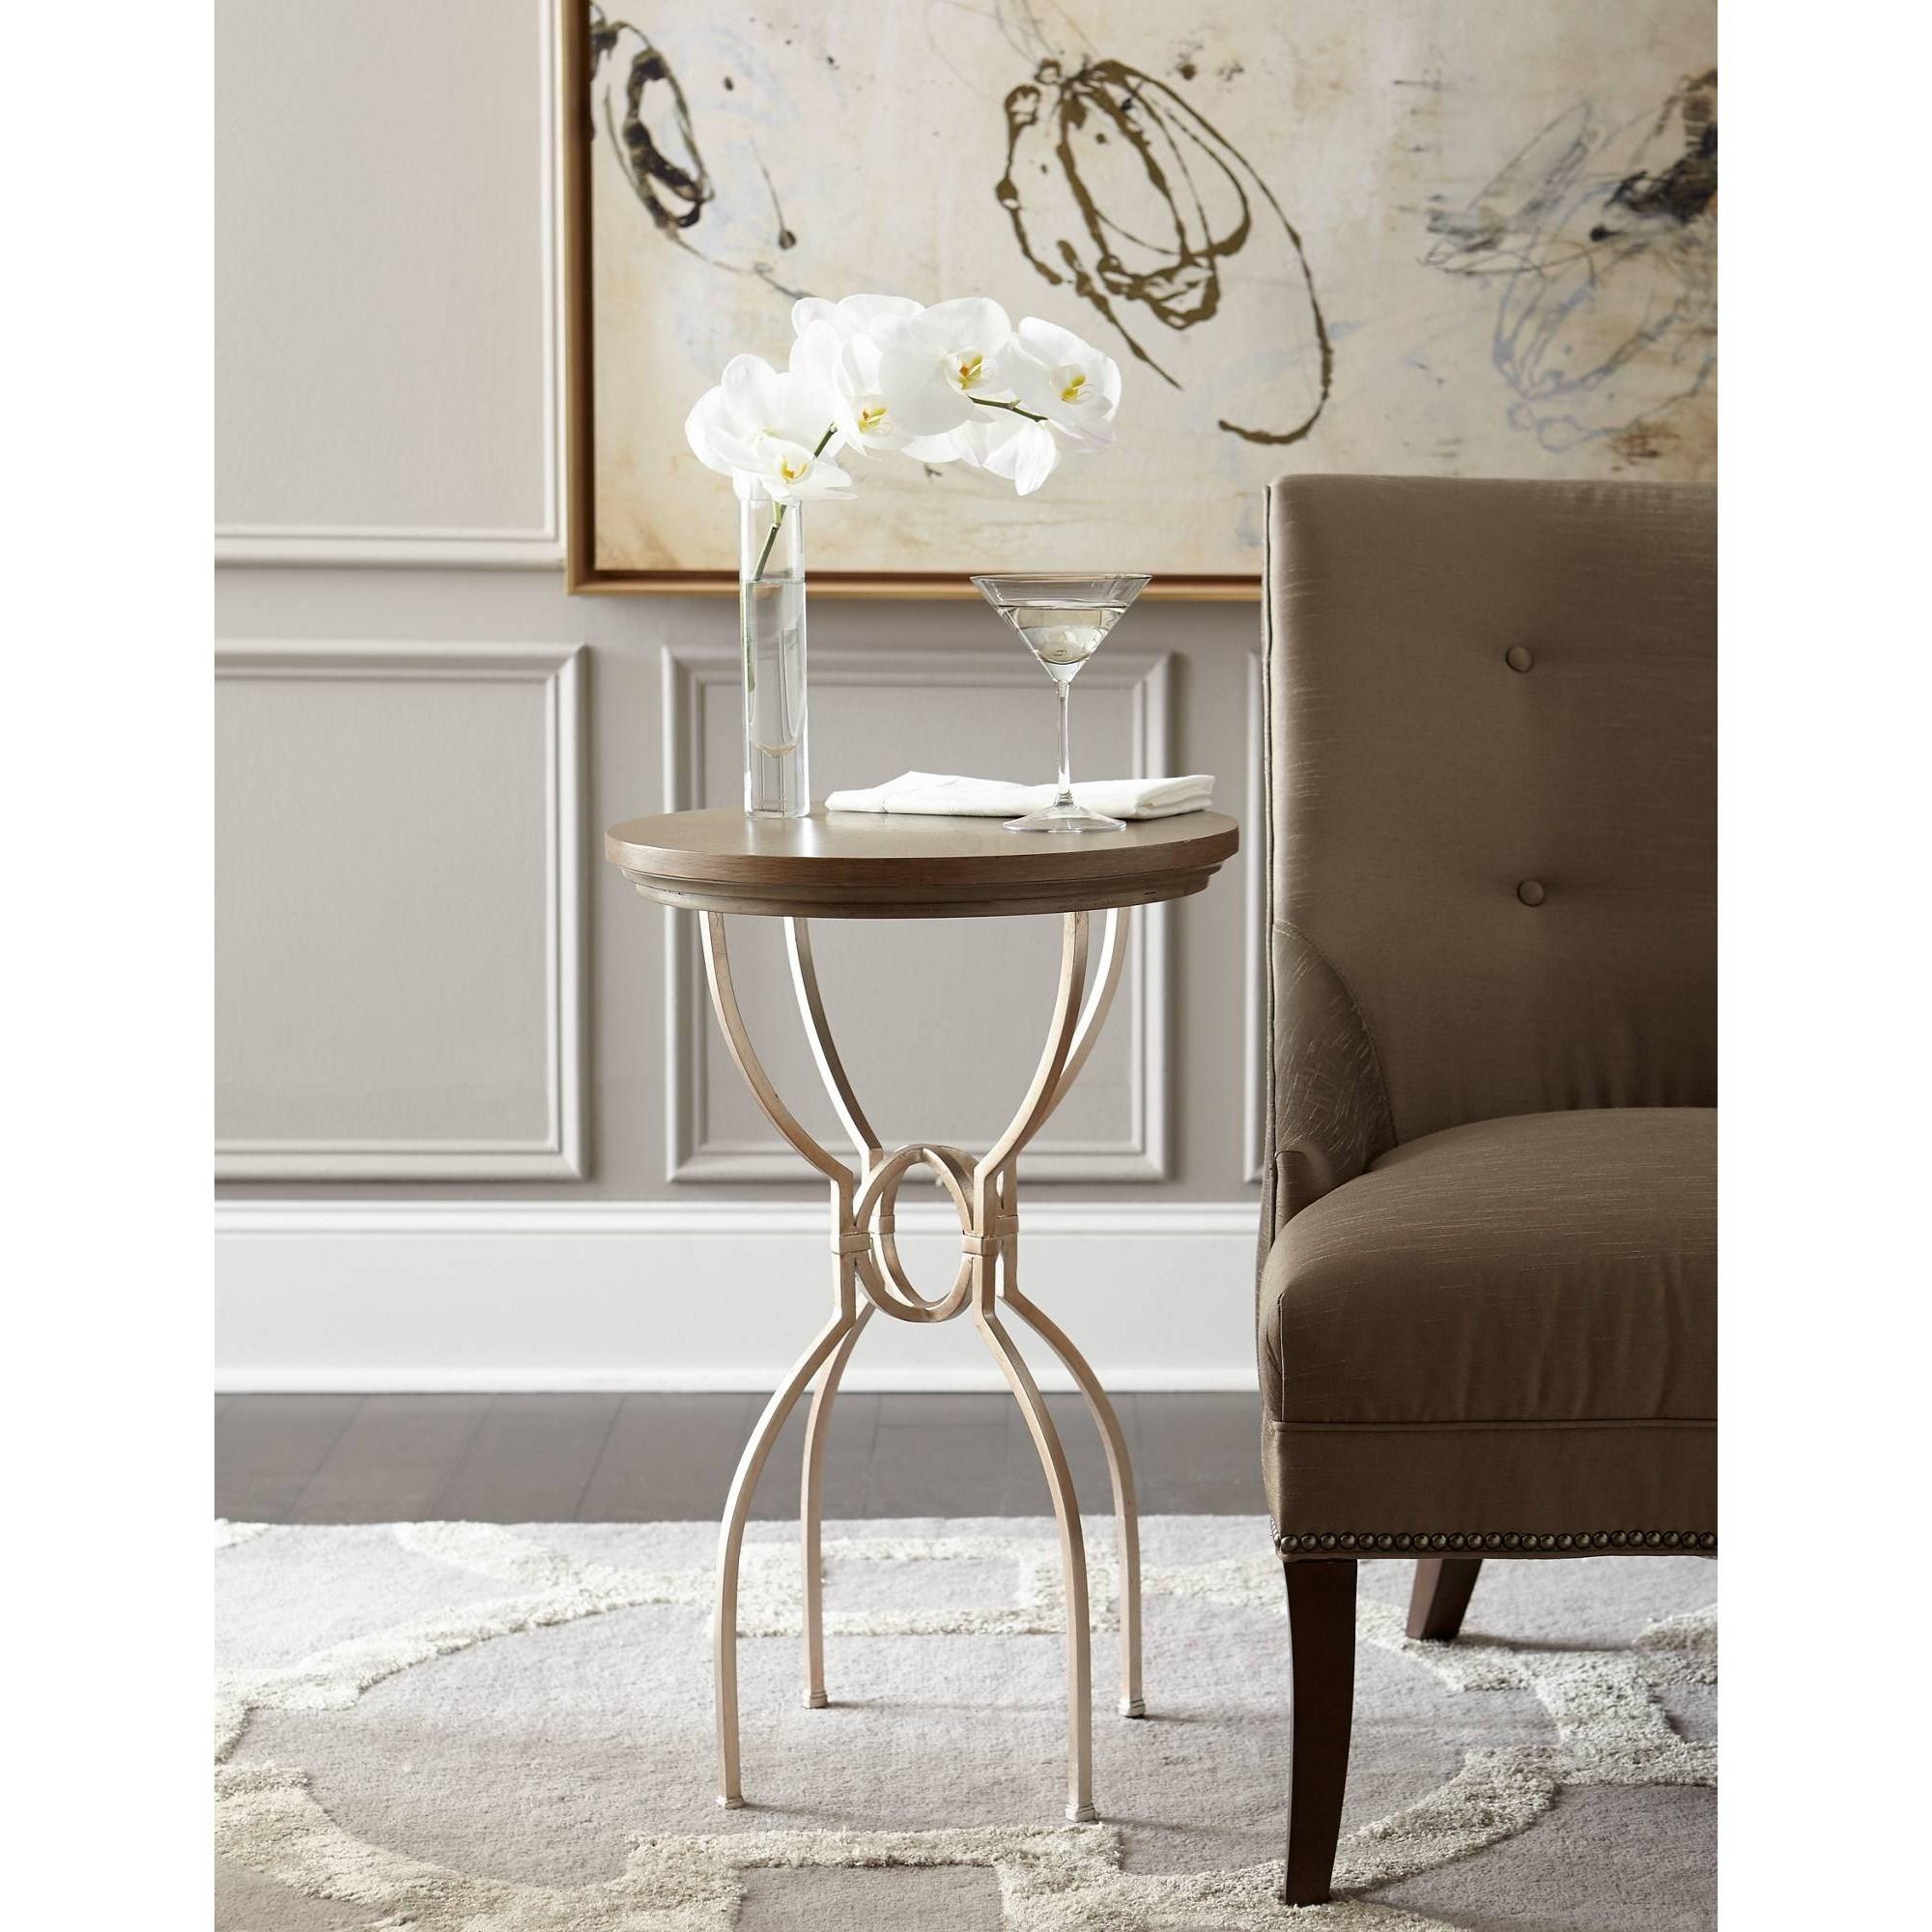 Stanley Furniture Virage 696 65 16 Martini Table with  : products2Fstanleyfurniture2Fcolor2Fvirage 894805332696 65 16 b10 from www.beckerfurnitureworld.com size 2000 x 2000 jpeg 461kB